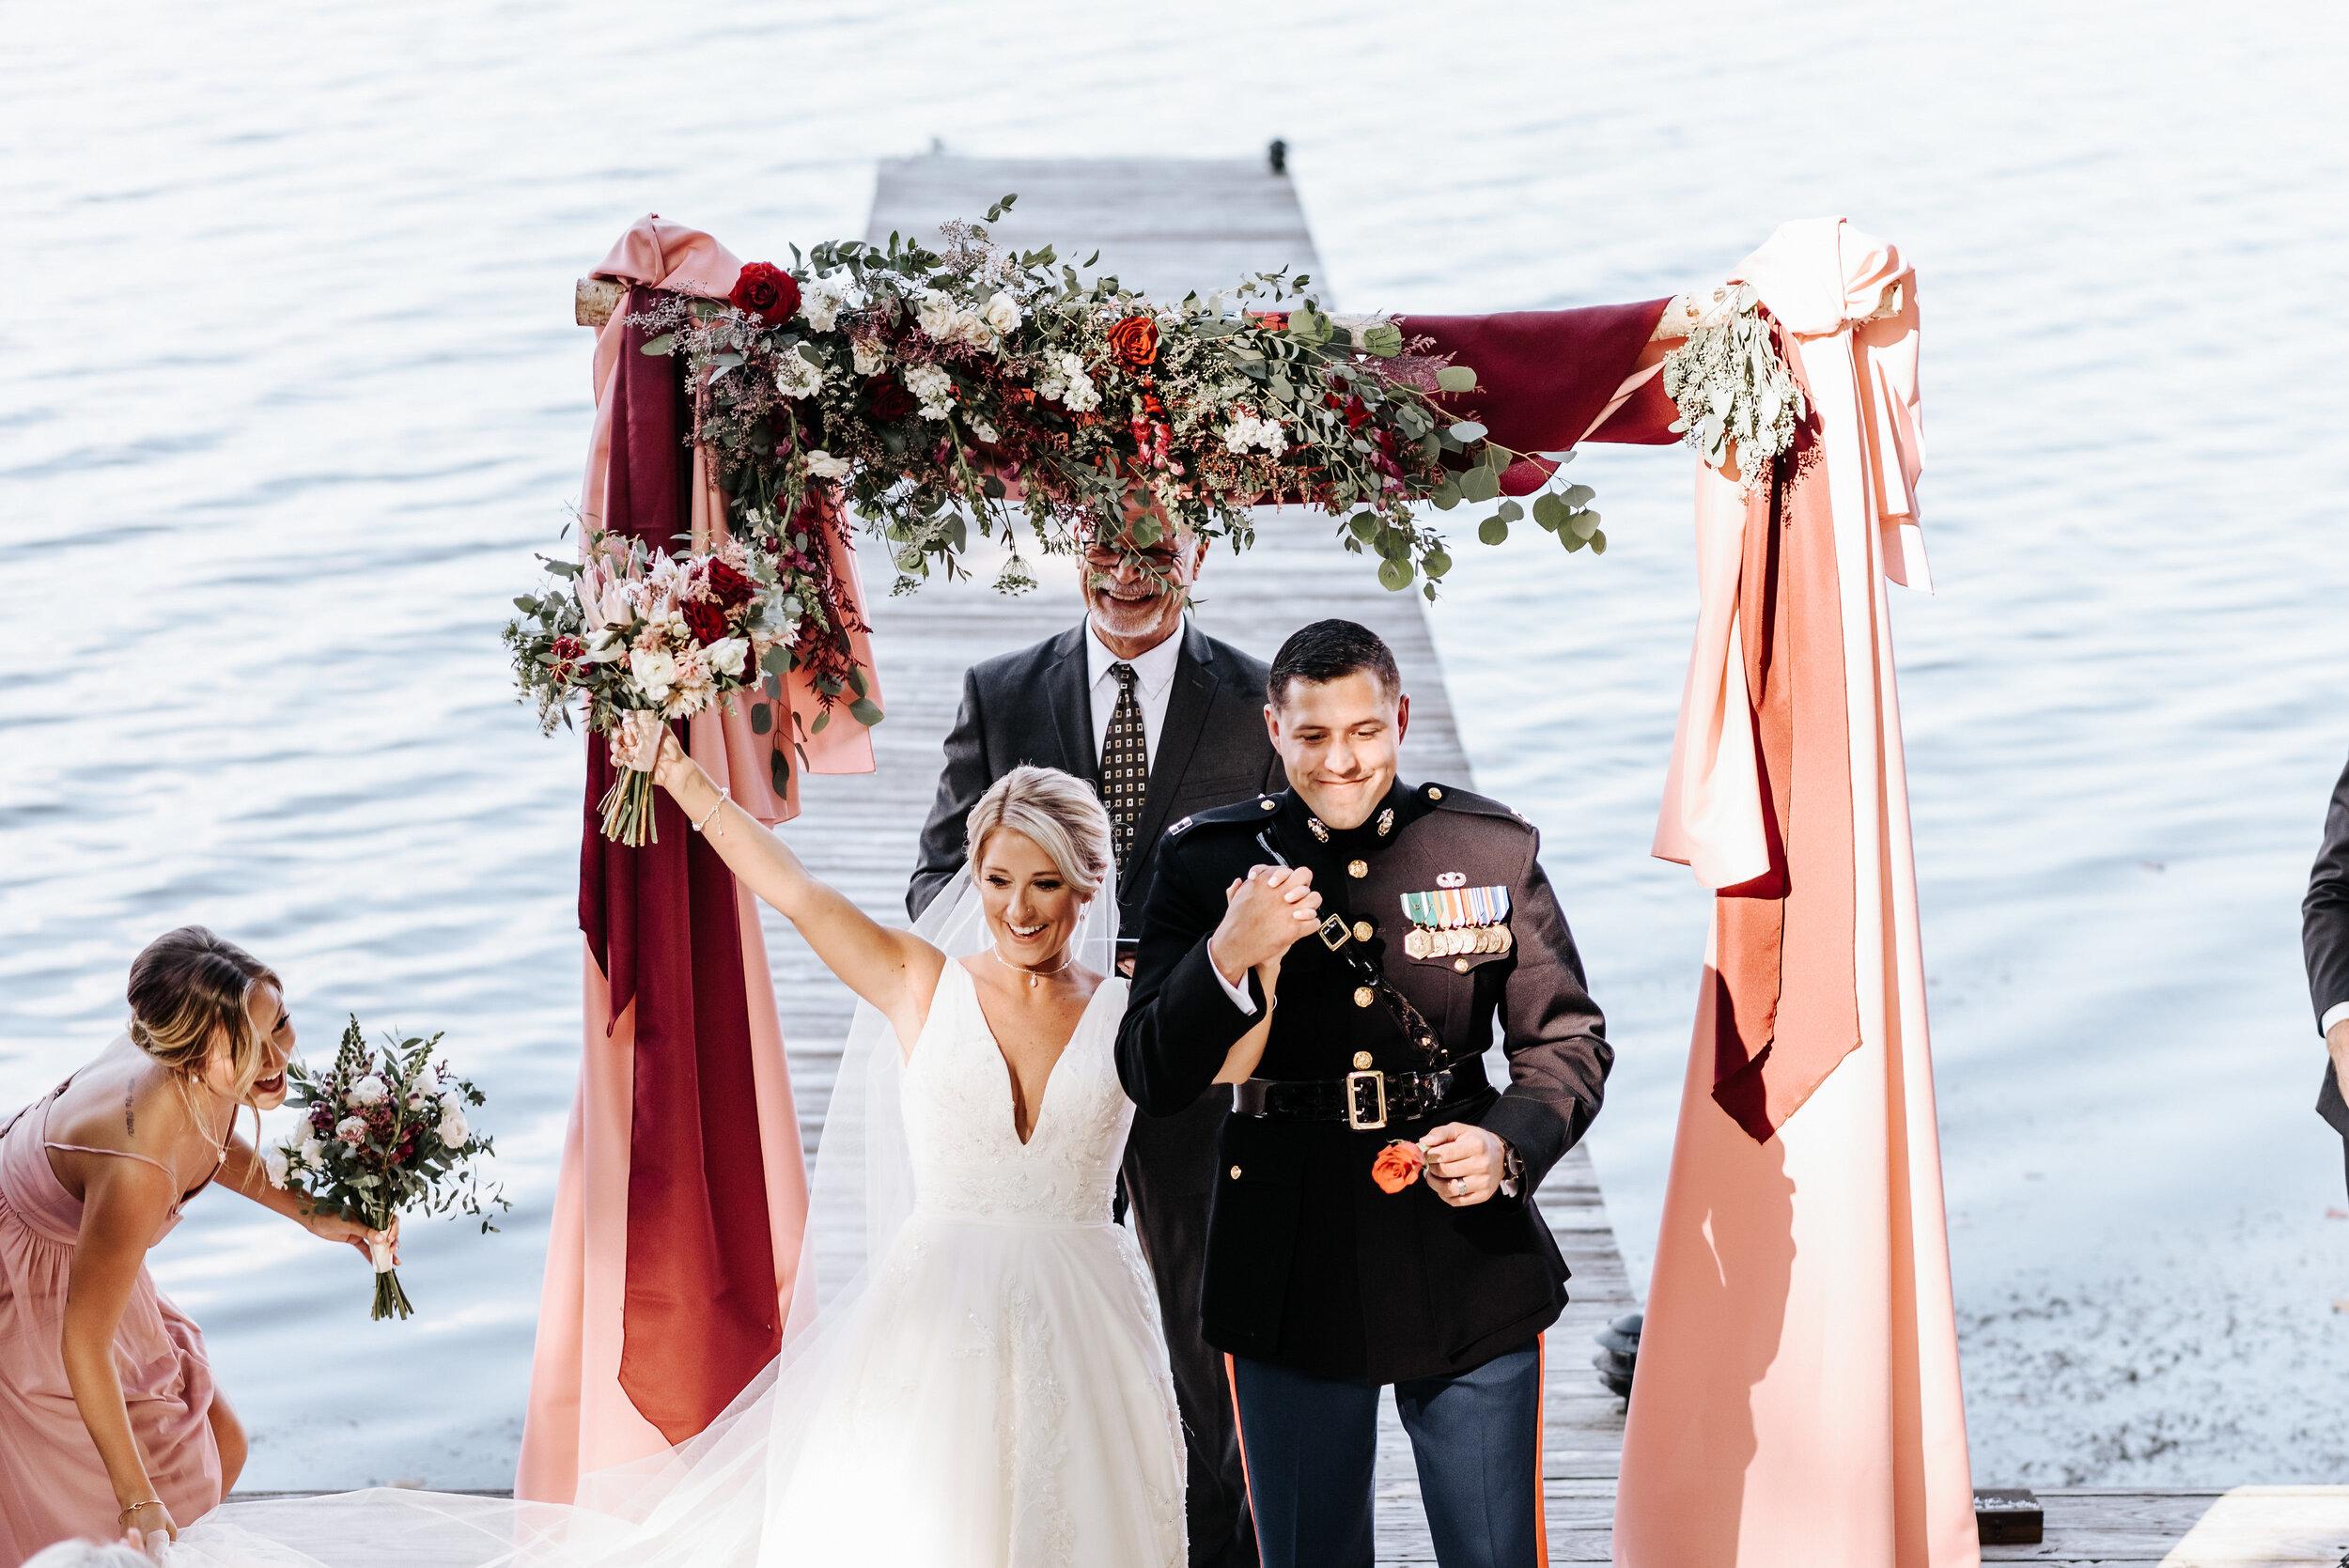 Emily_Mike_Wedding_Celebrations_at_the_Reservoir_Pool_Pavilion_Richmond_Virginia_Wedding_Photographer_Photography_by_V_53.jpg